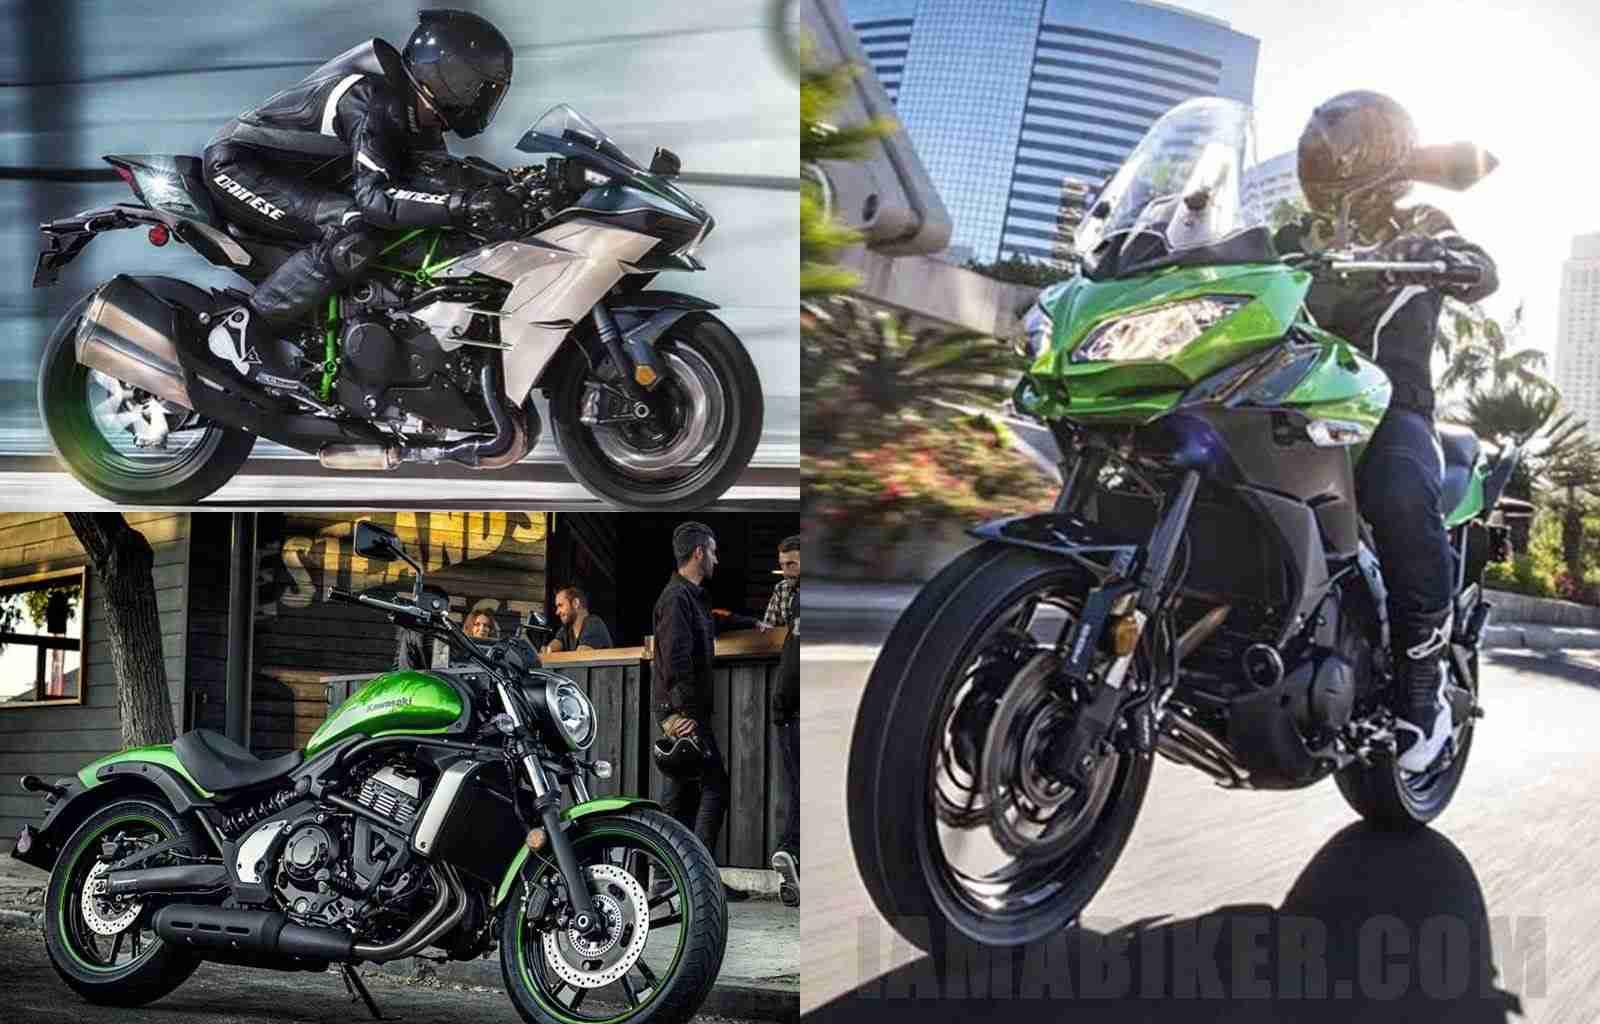 2015 Kawasaki launches